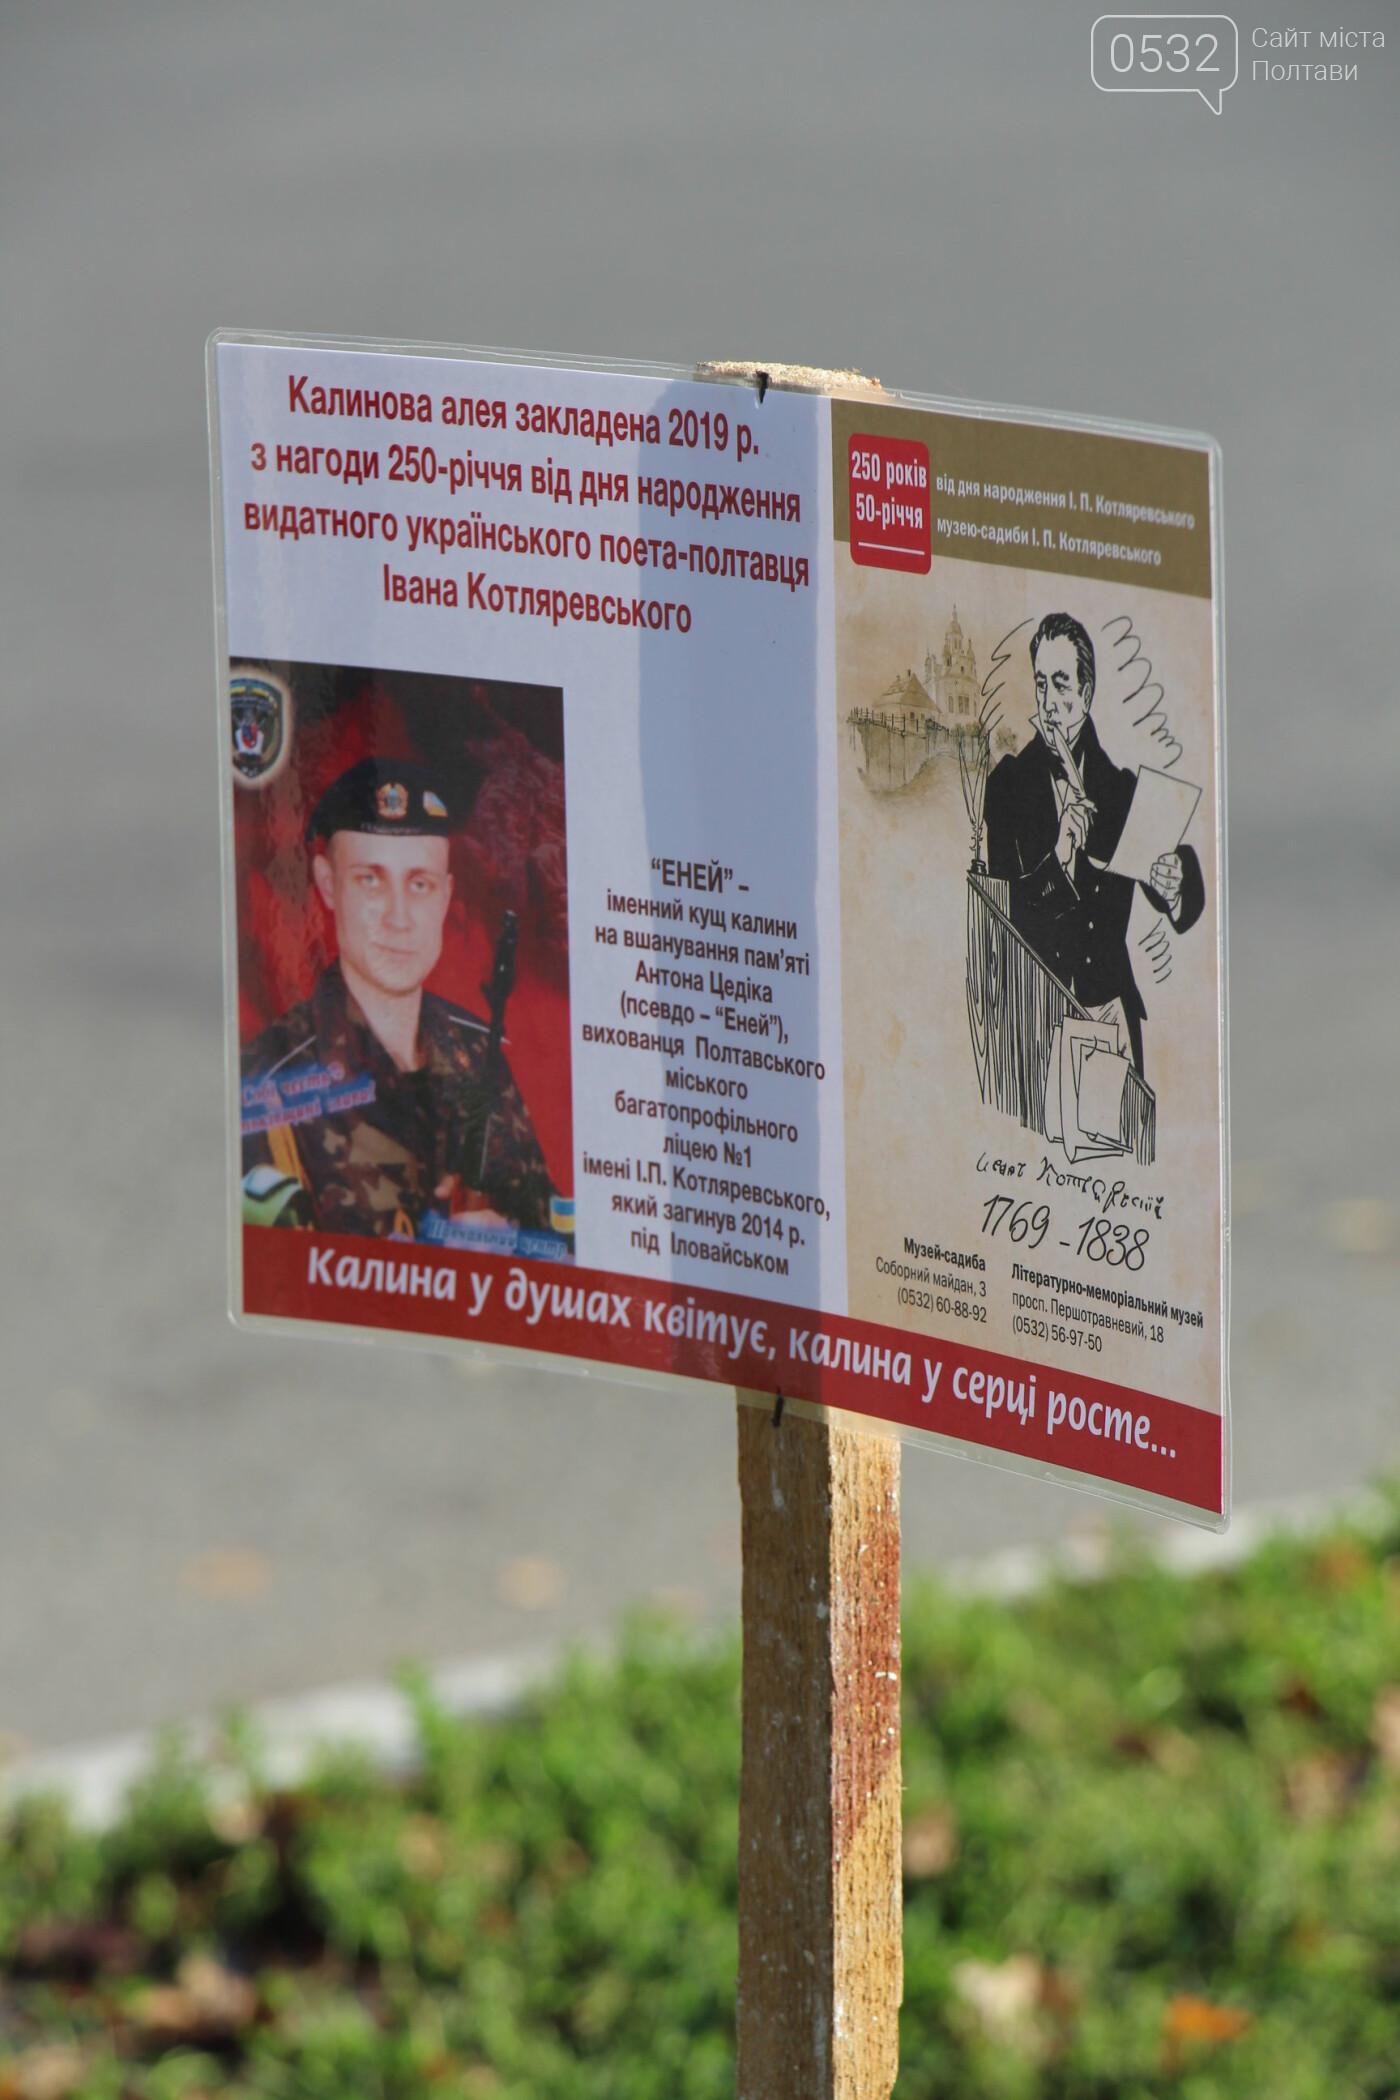 У Полтаві заклали калинову алею на честь Котляревського та загиблого Енея (ФОТО), фото-4